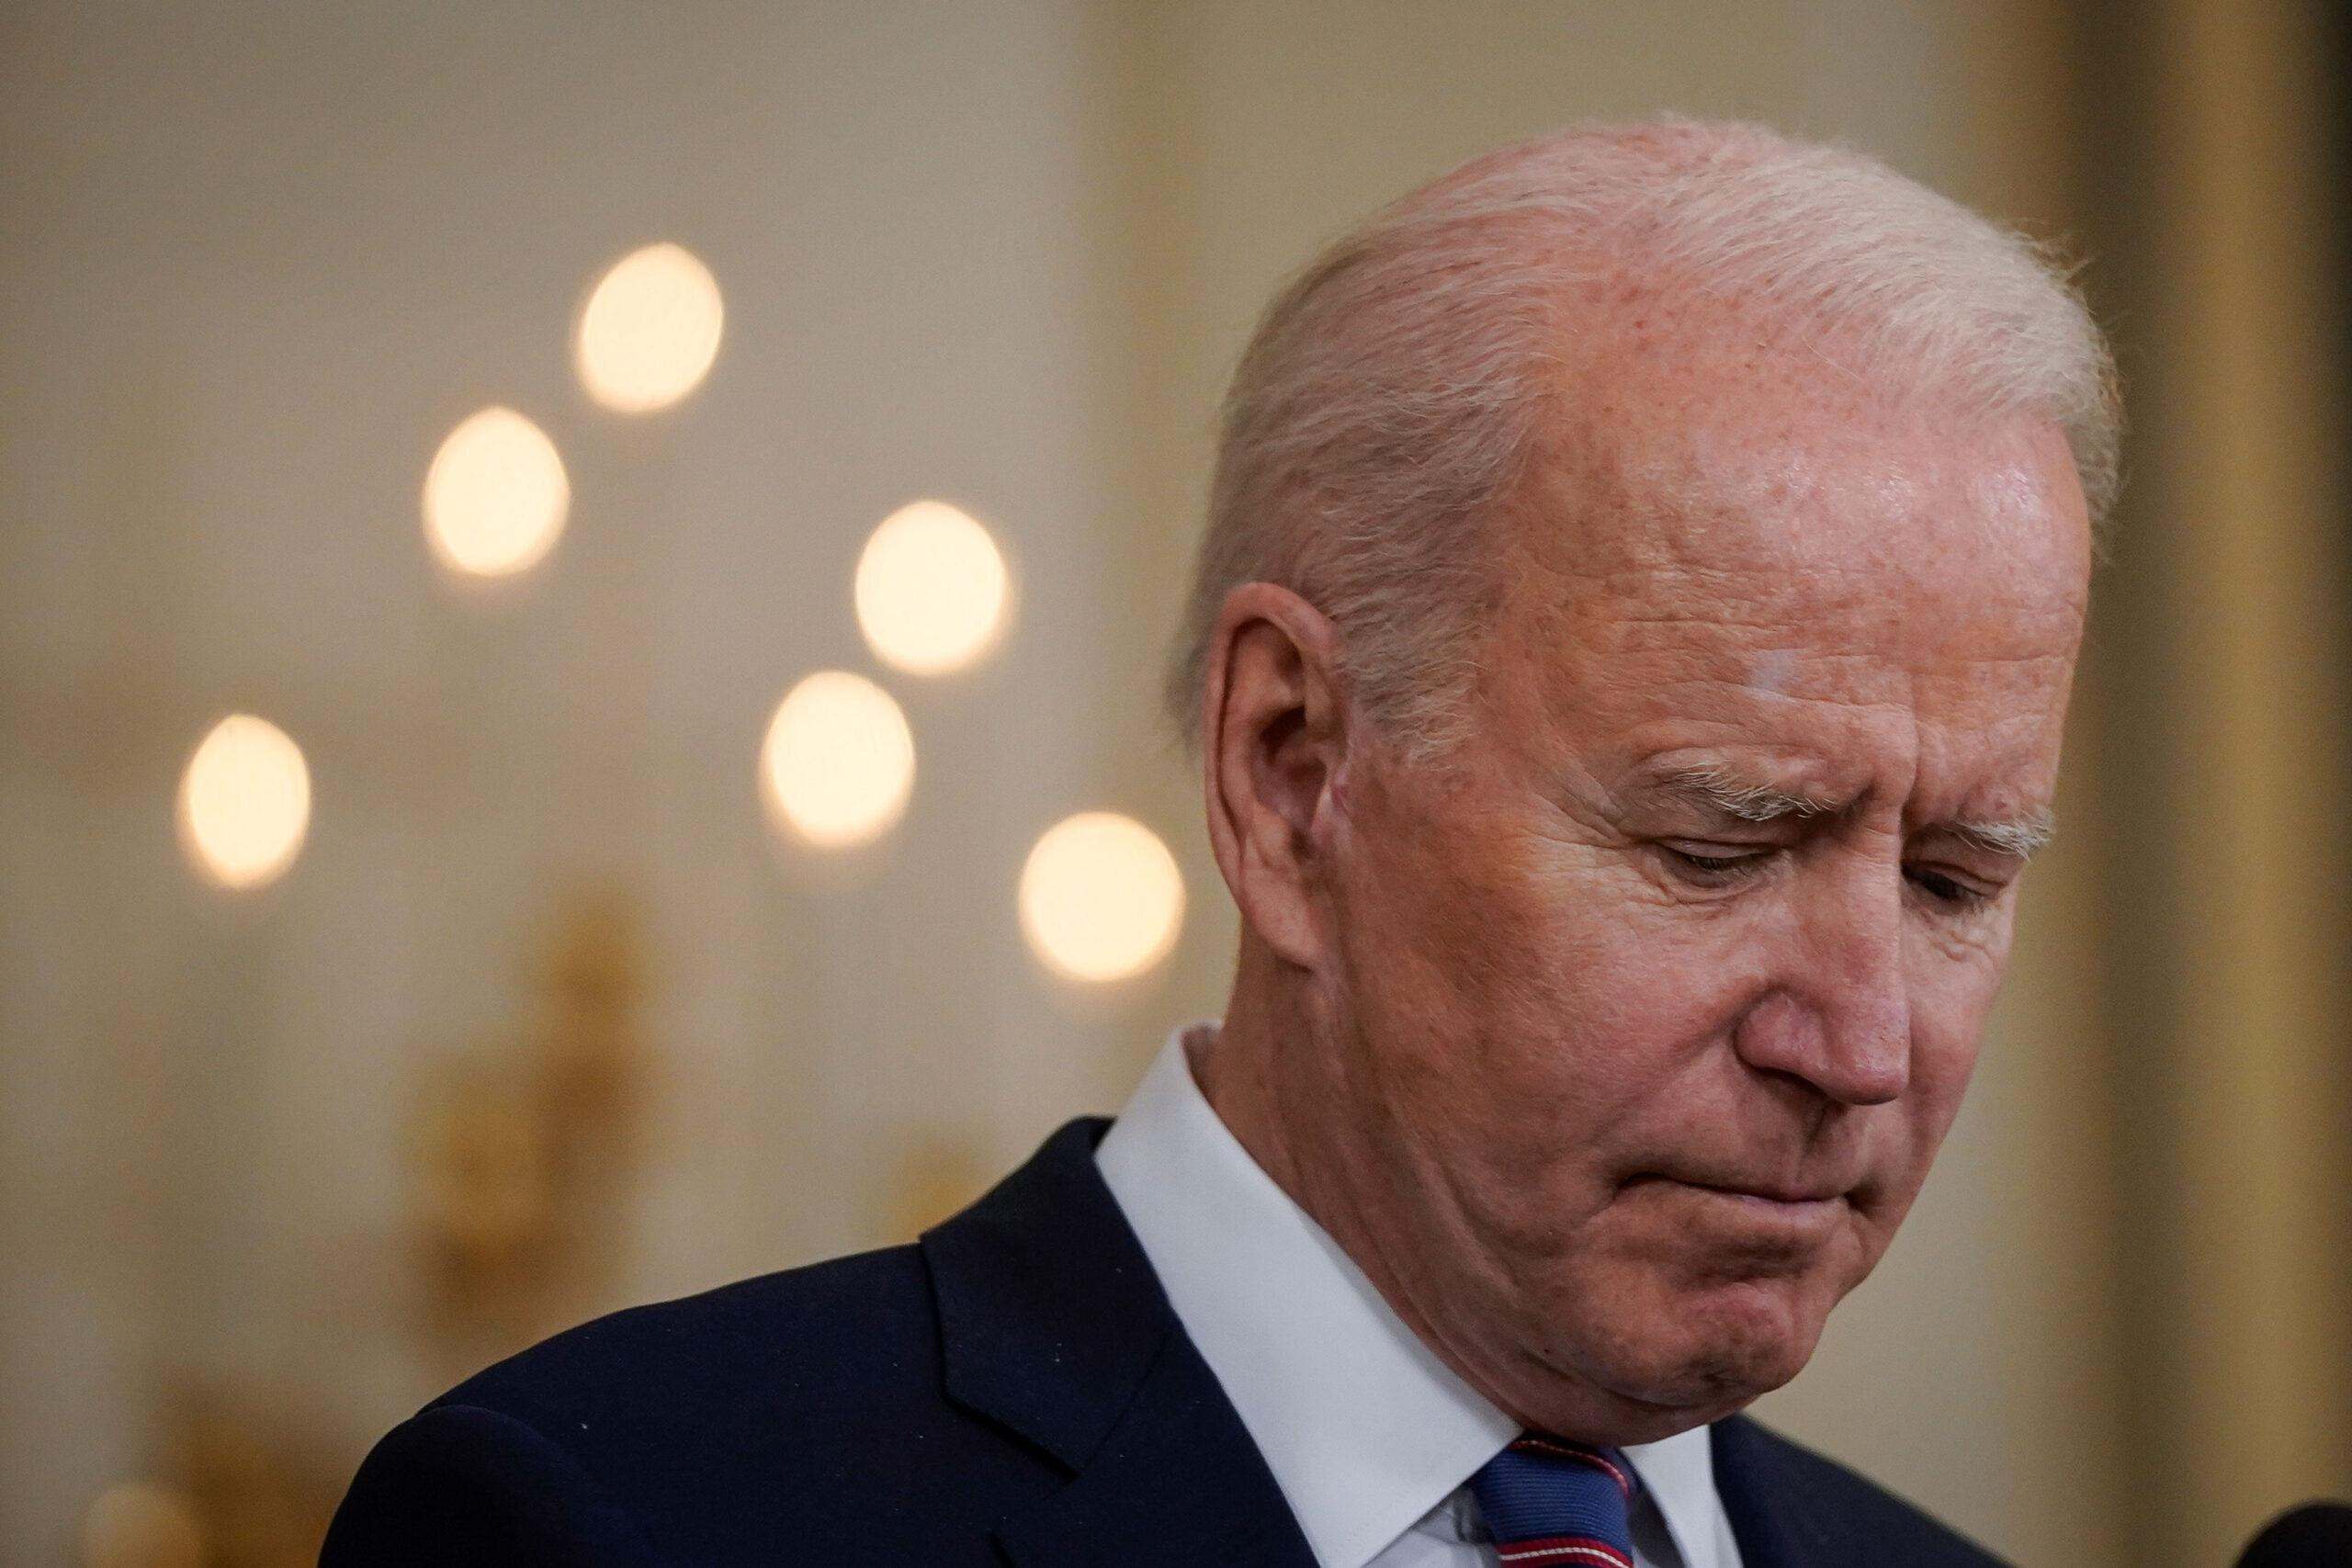 President Biden aware of Capitol incident